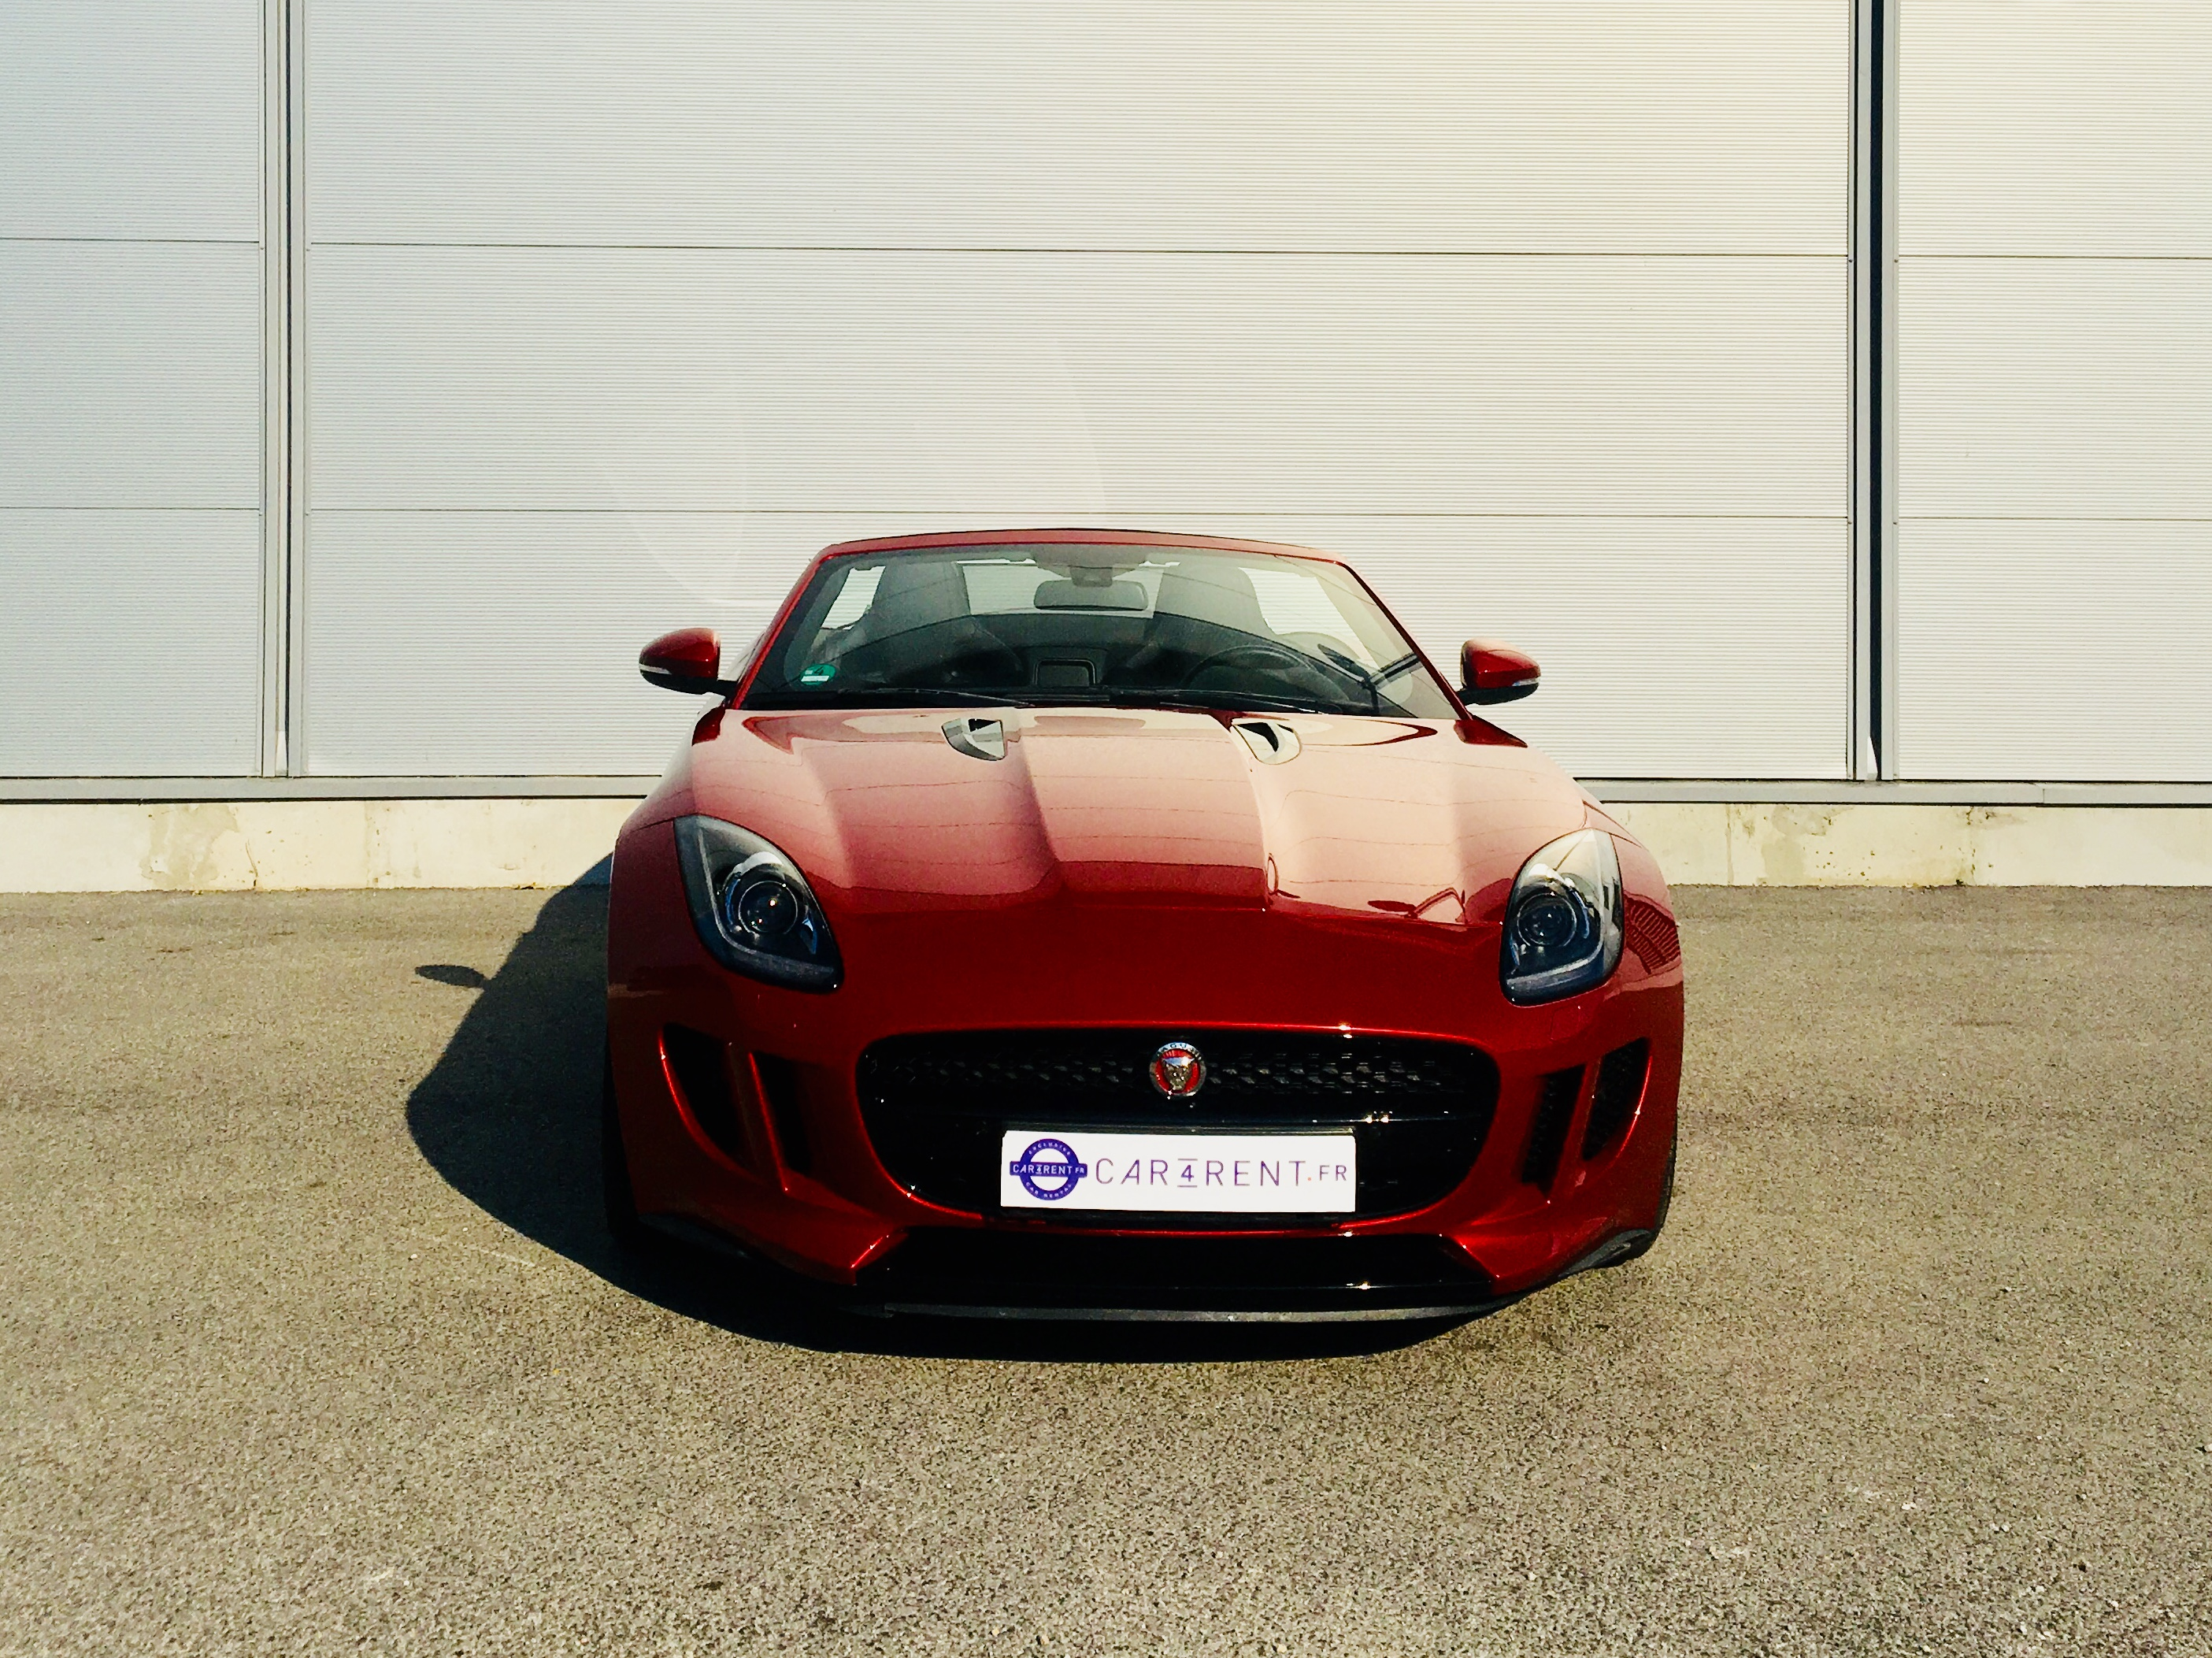 hire jaguar F-Type Convertible car4rent luxury car rental cannes